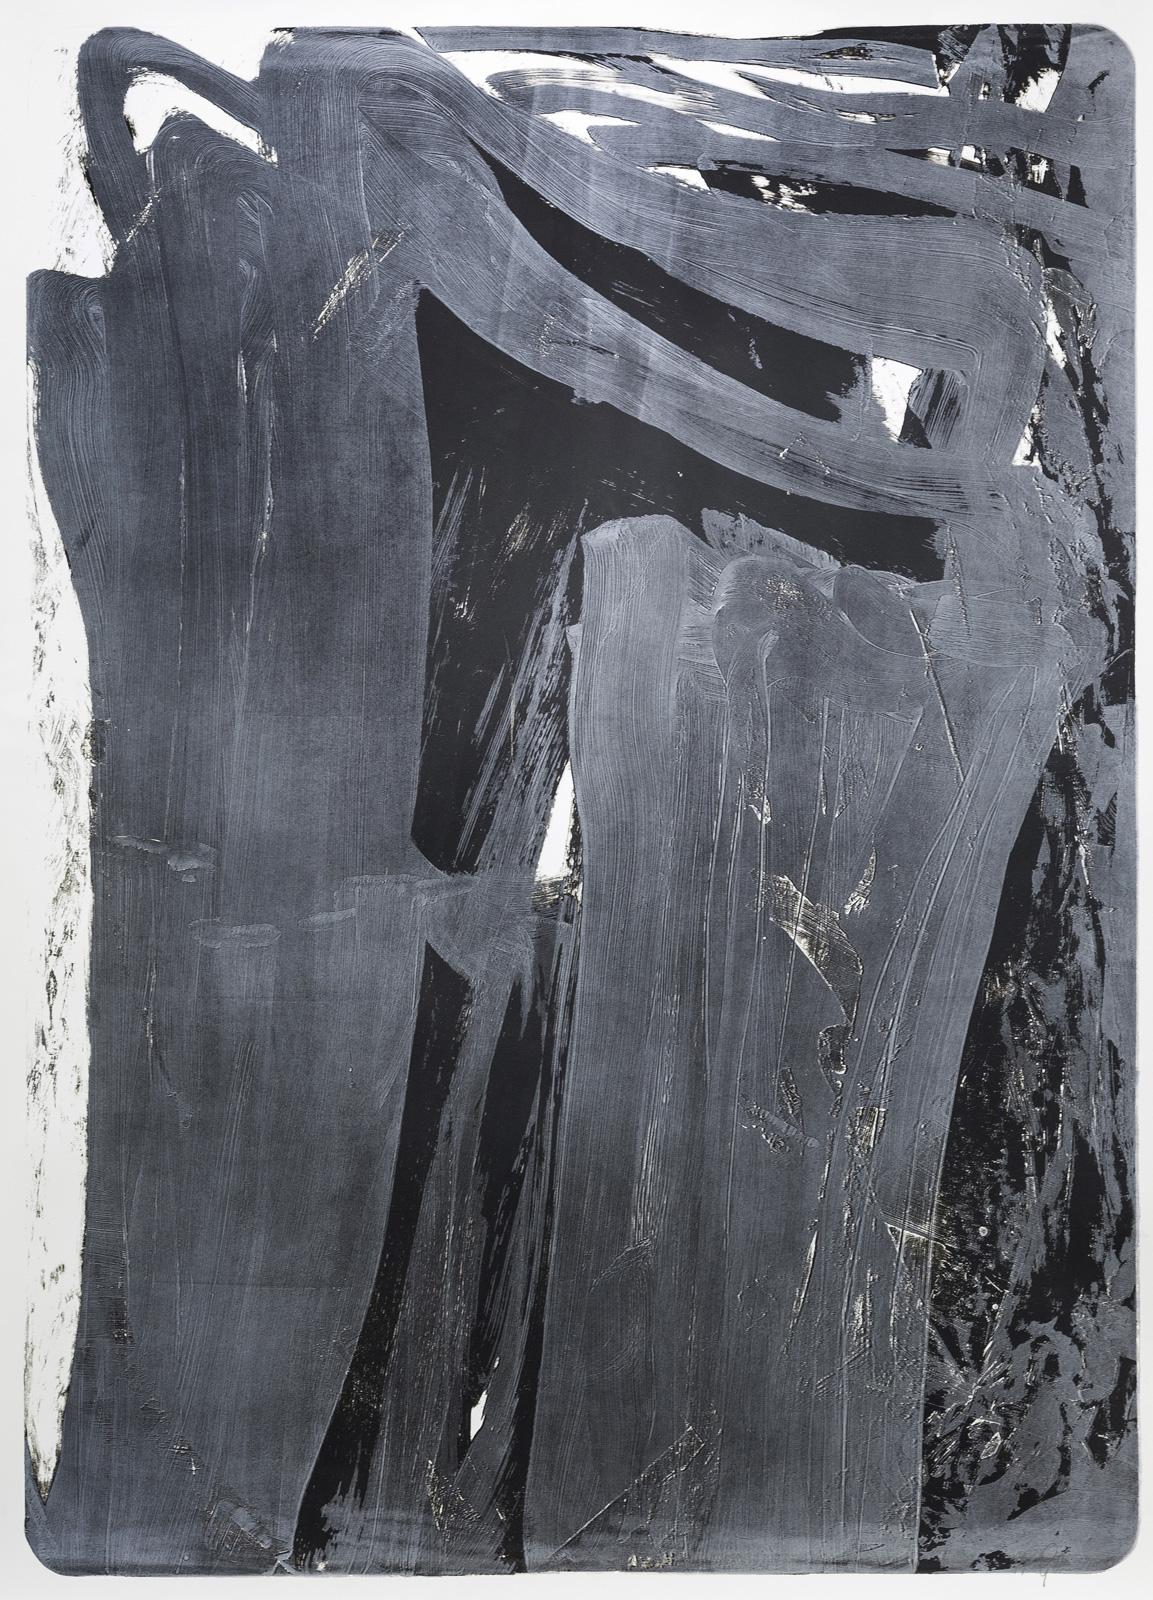 Palimpsest 2, 2020, Lithographie, silber/schwarz, 181x131cm